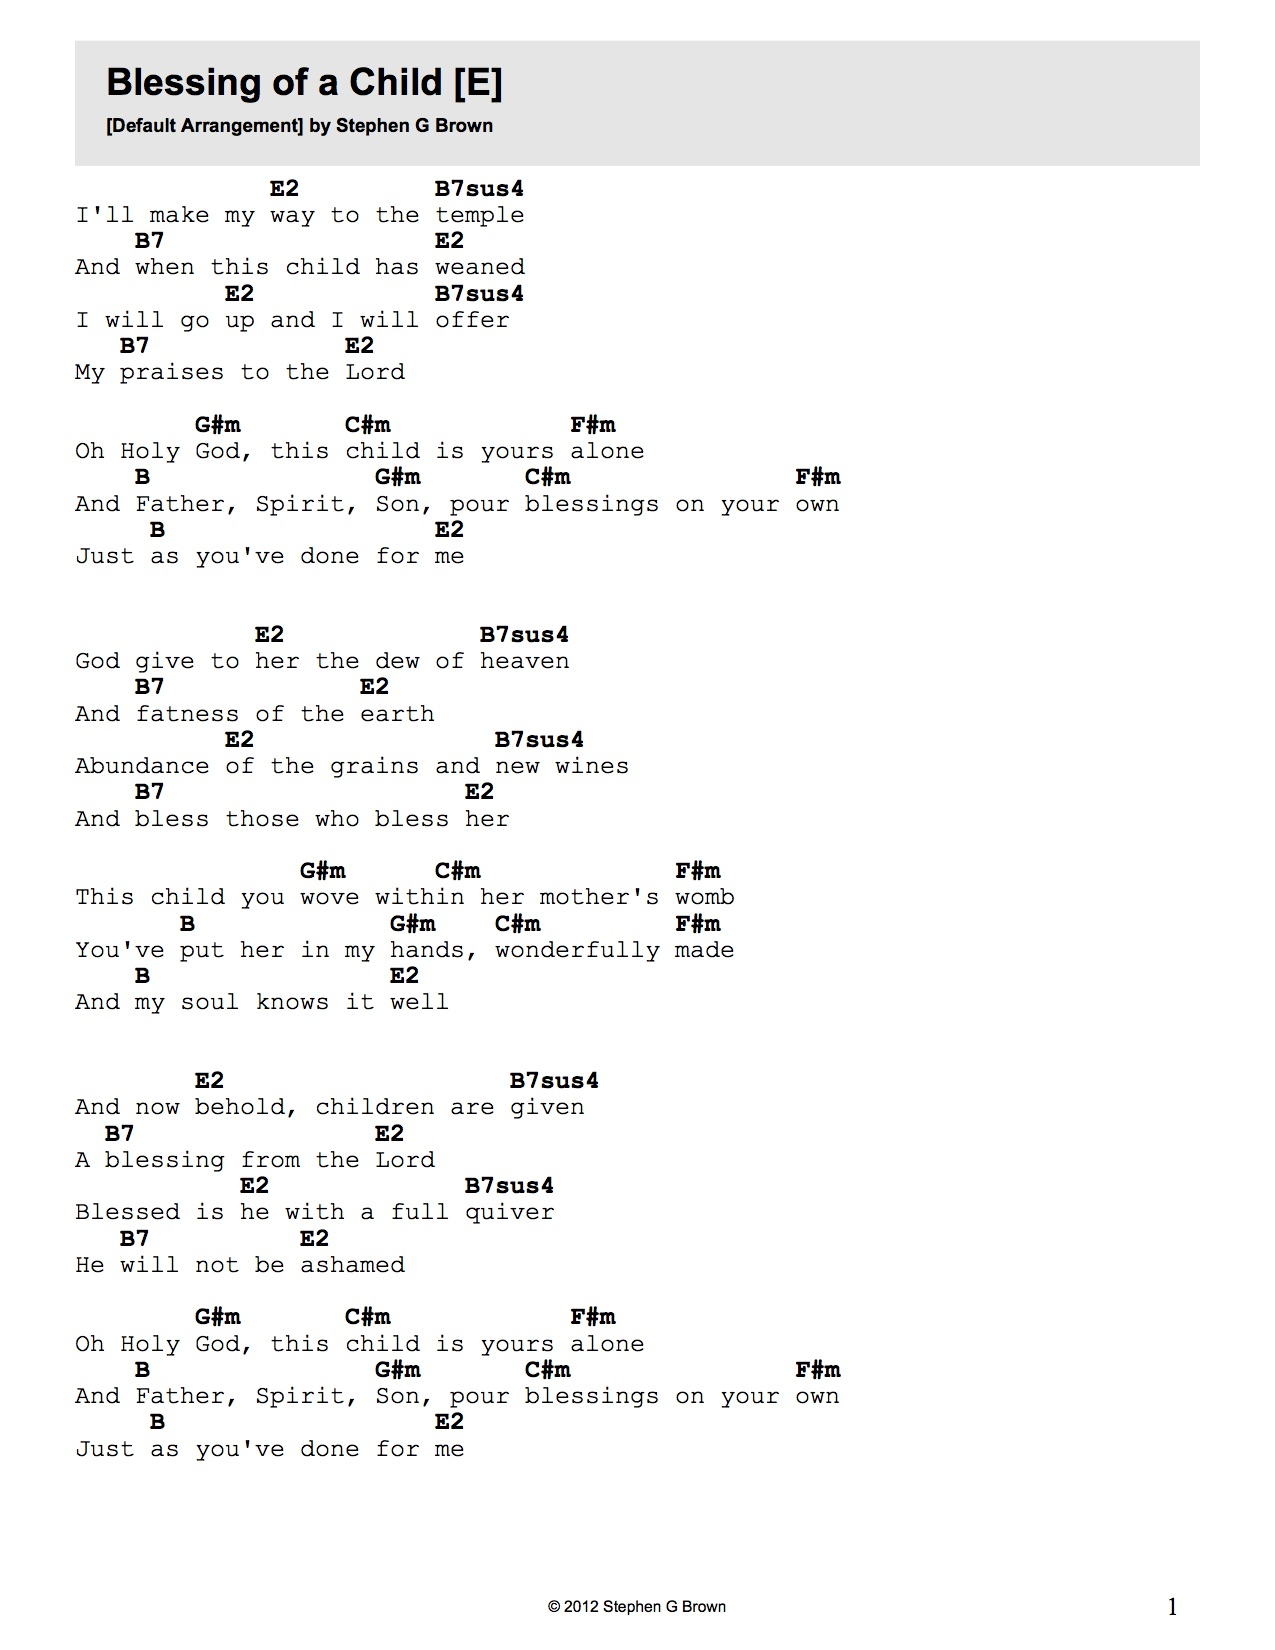 Brownian Worship Music Worship Music By Stephen G Brown